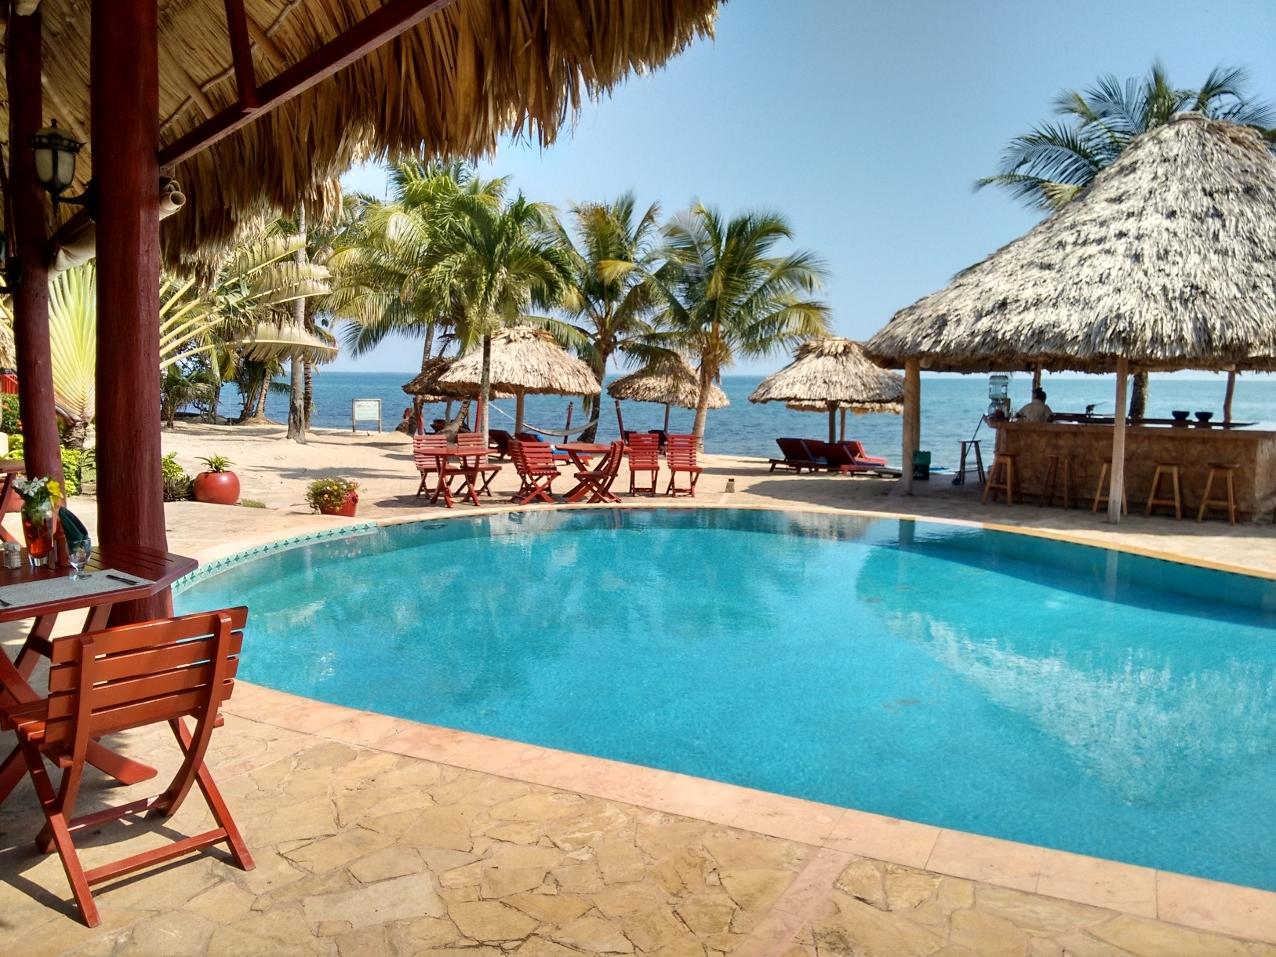 Belizean Dreams Resort, Hopkins Beach, Belize